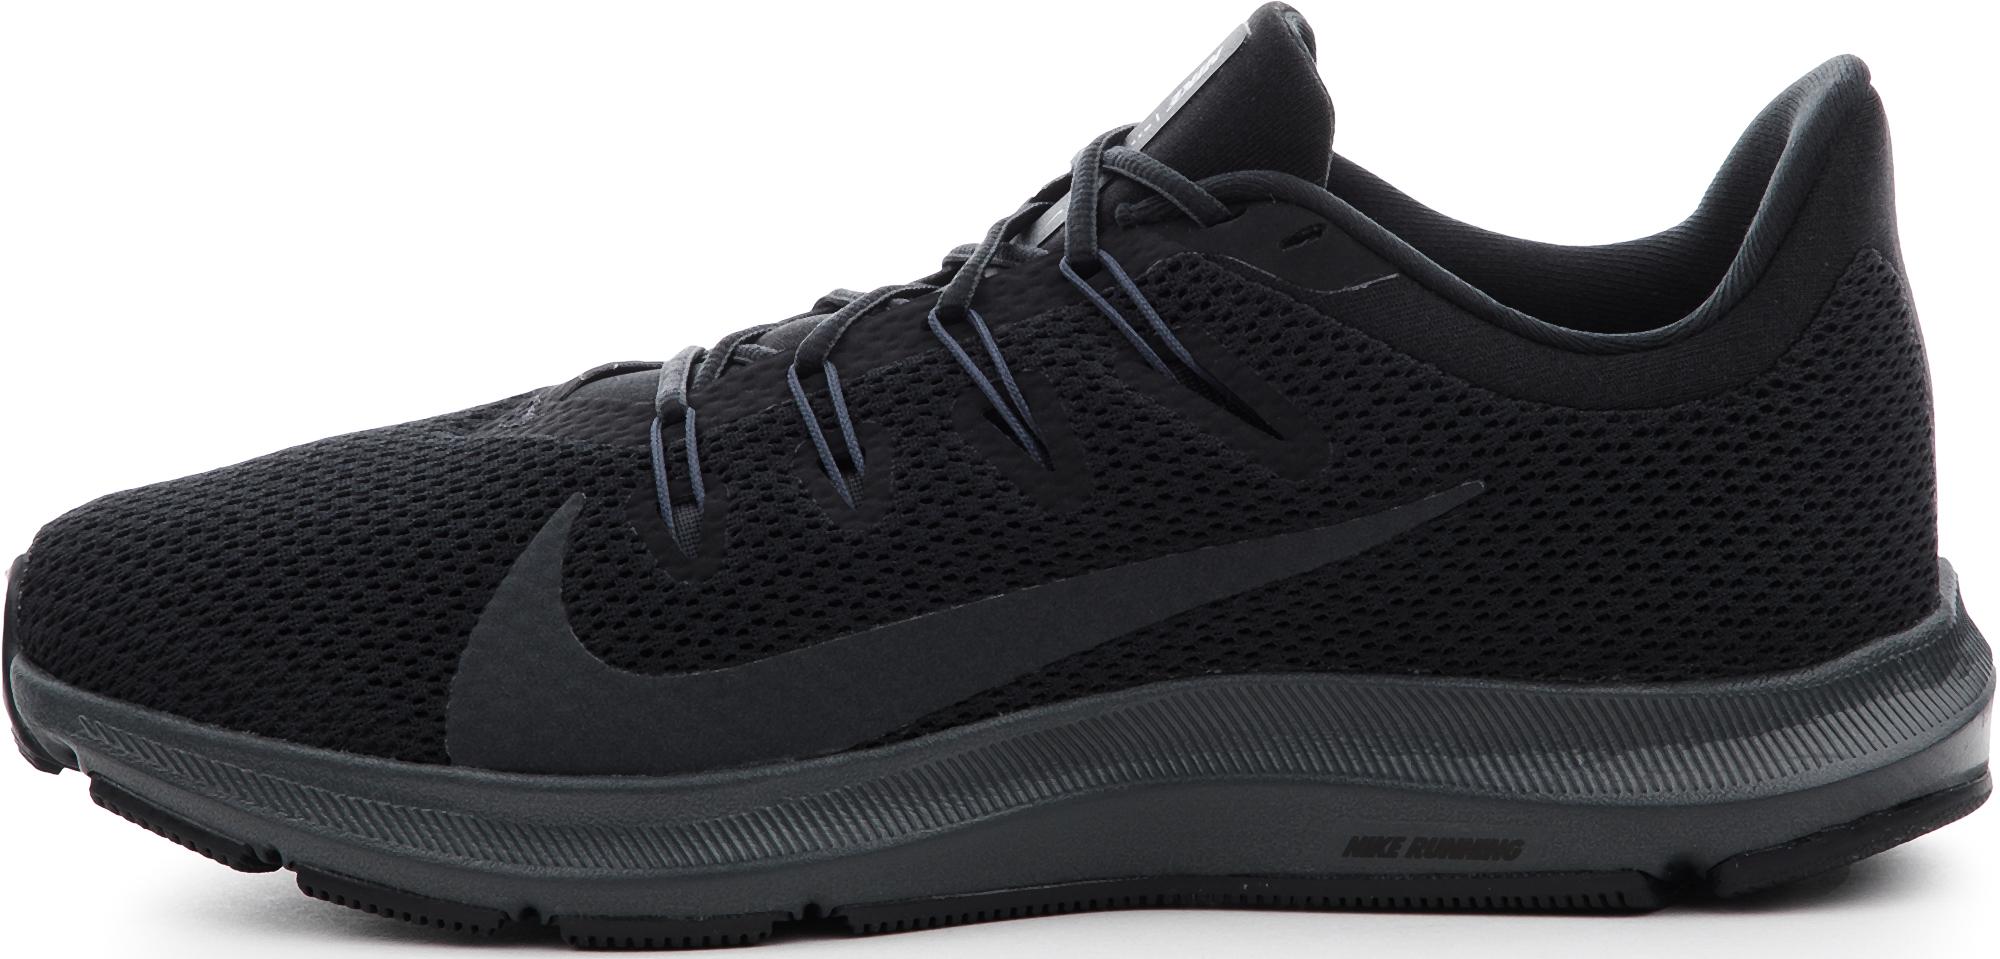 Nike Кроссовки женские Nike Quest 2, размер 40